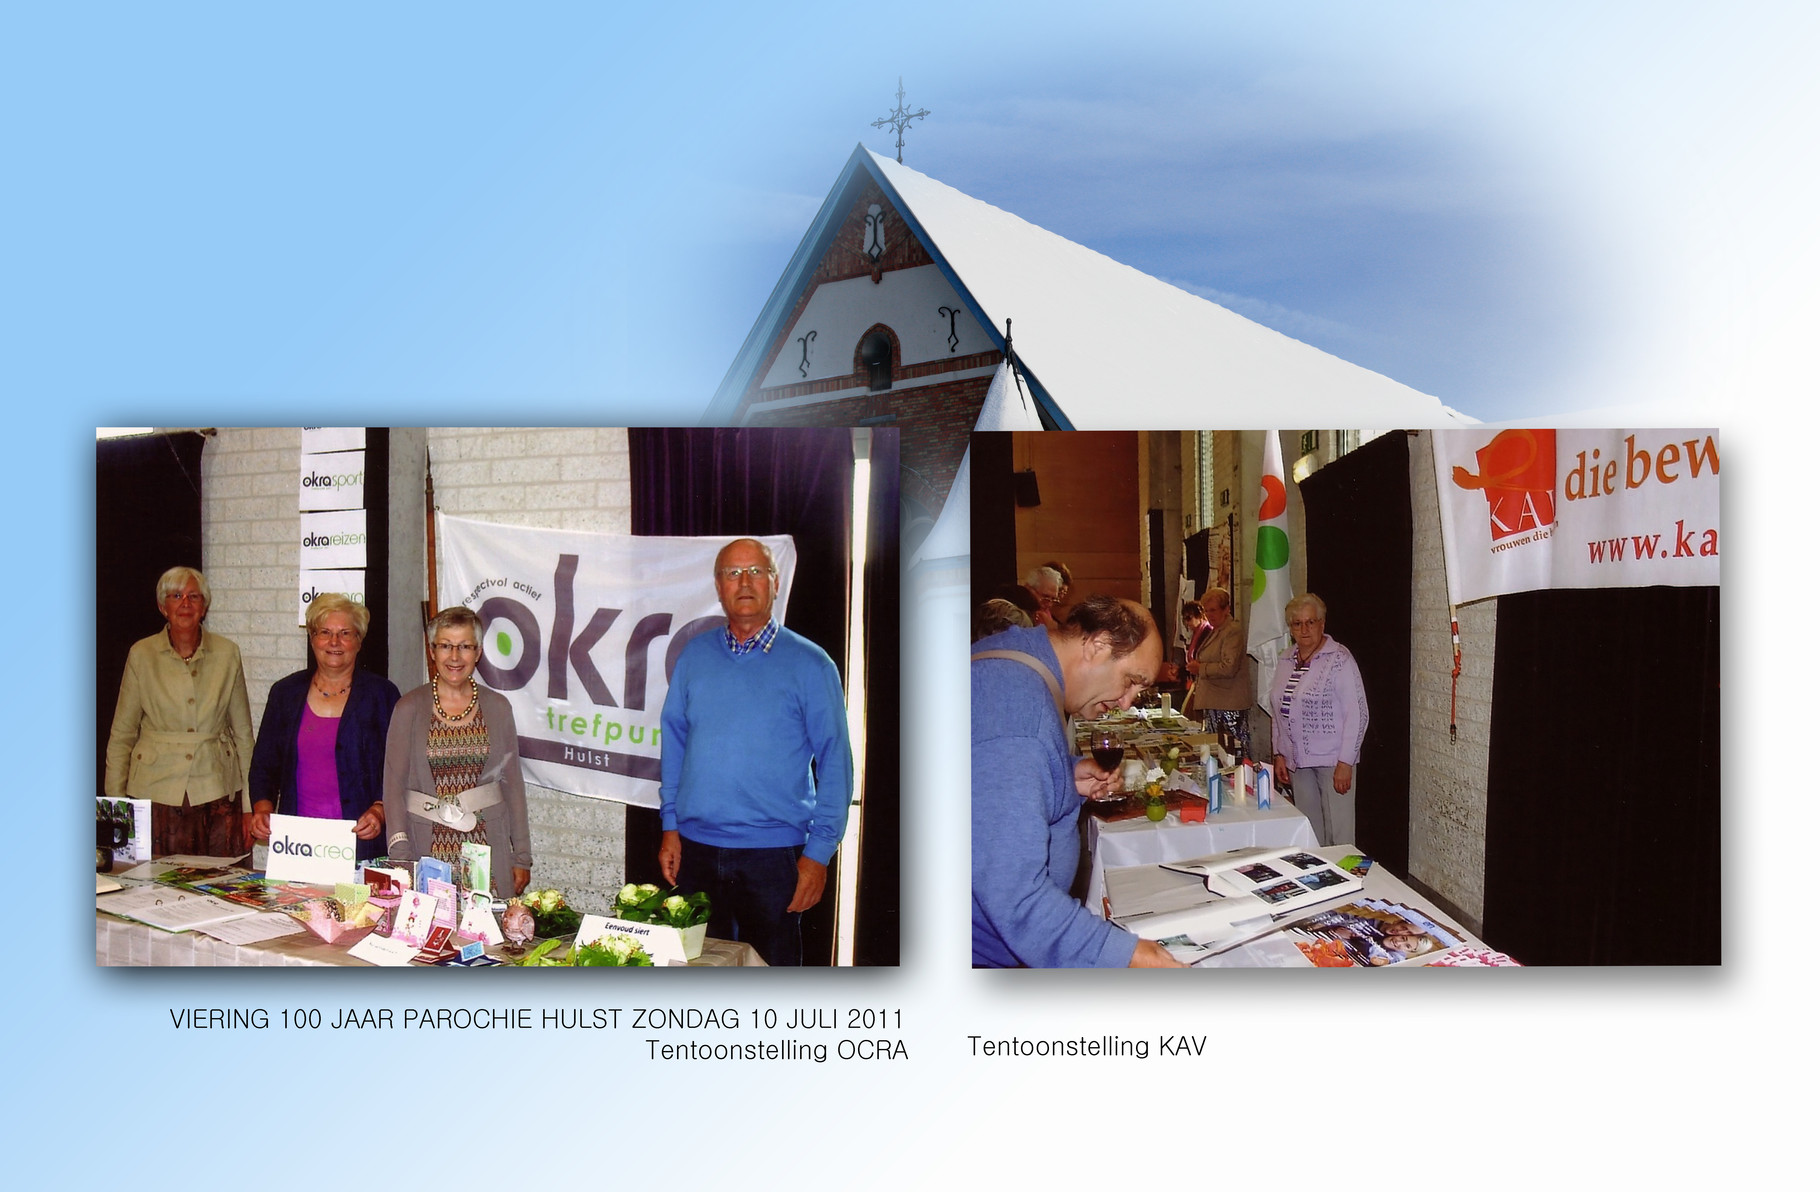 Tentoonstelling OKRA en rechts KAV